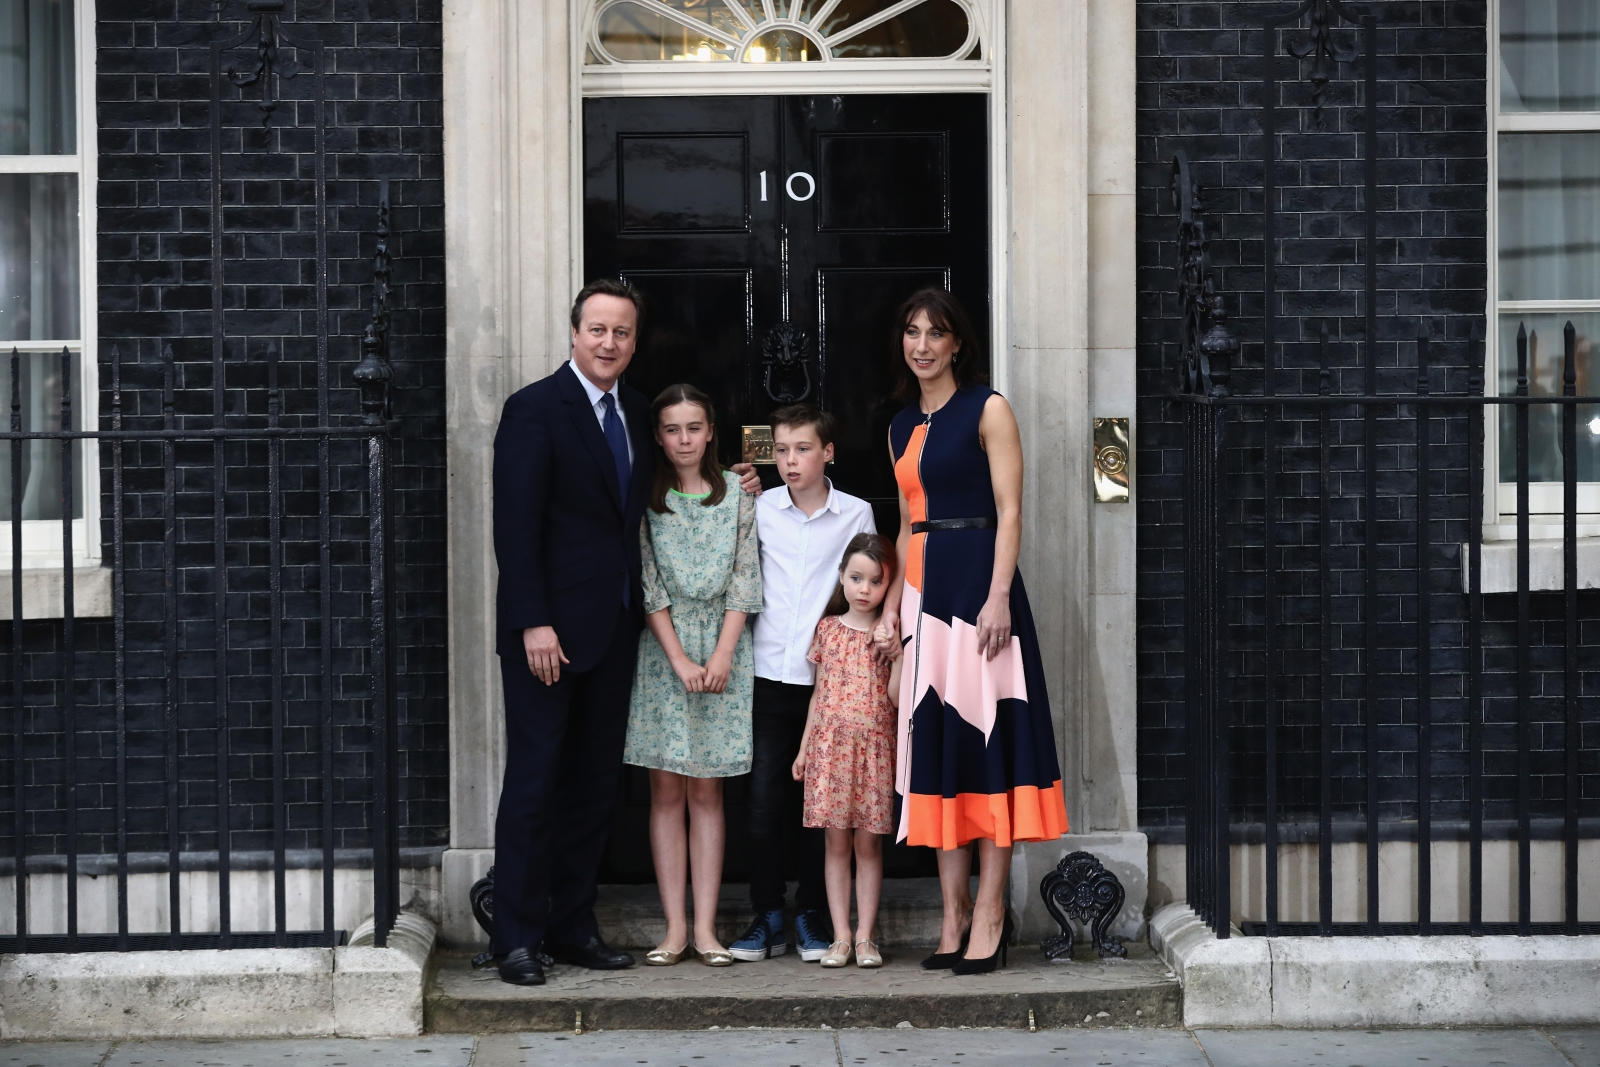 David Cameron's last day